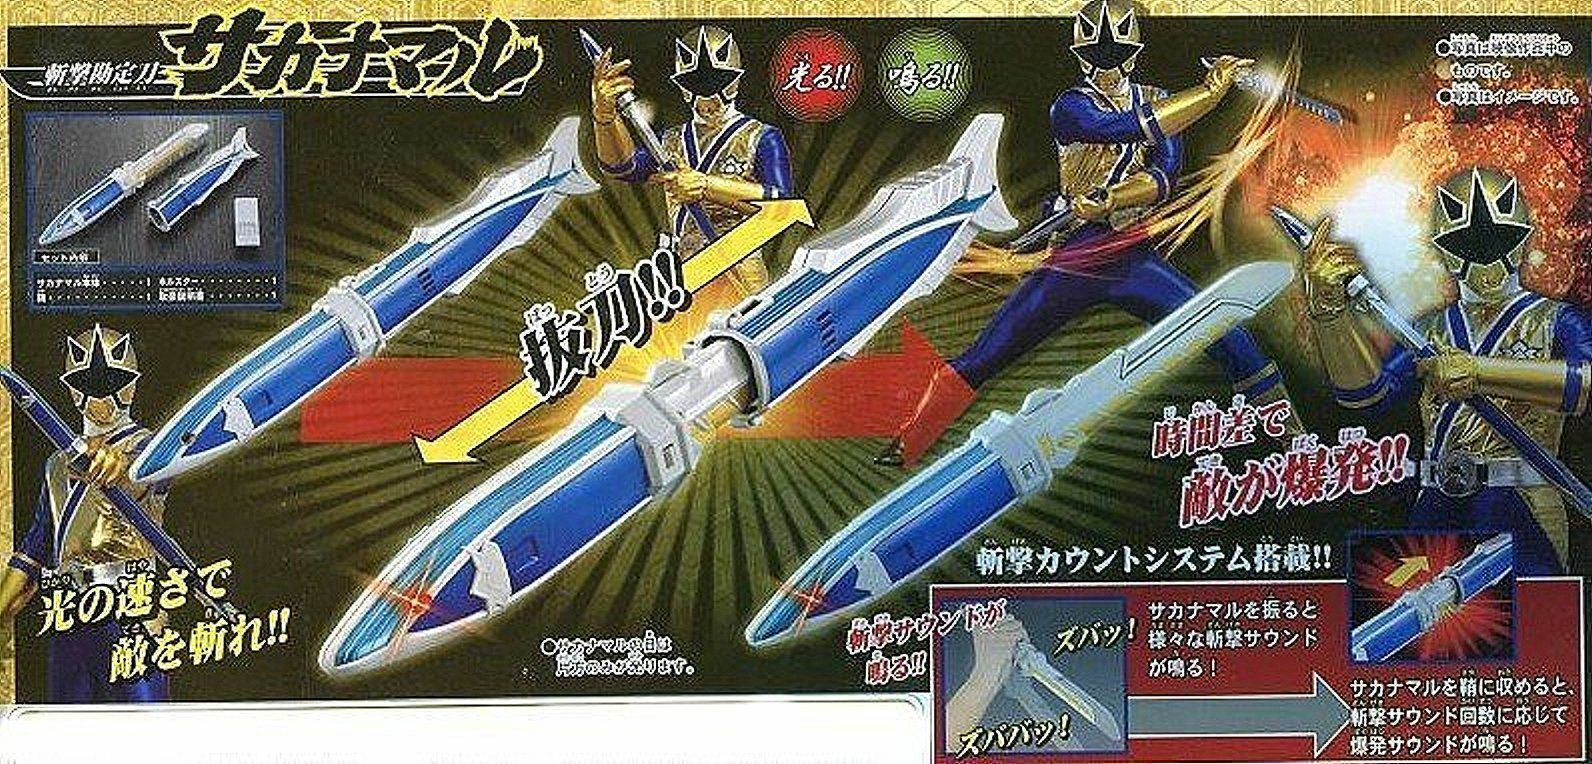 Power Rangers Samurai Sentai Shinkenger gold Mega Light Sword Sakanamaru Morpher